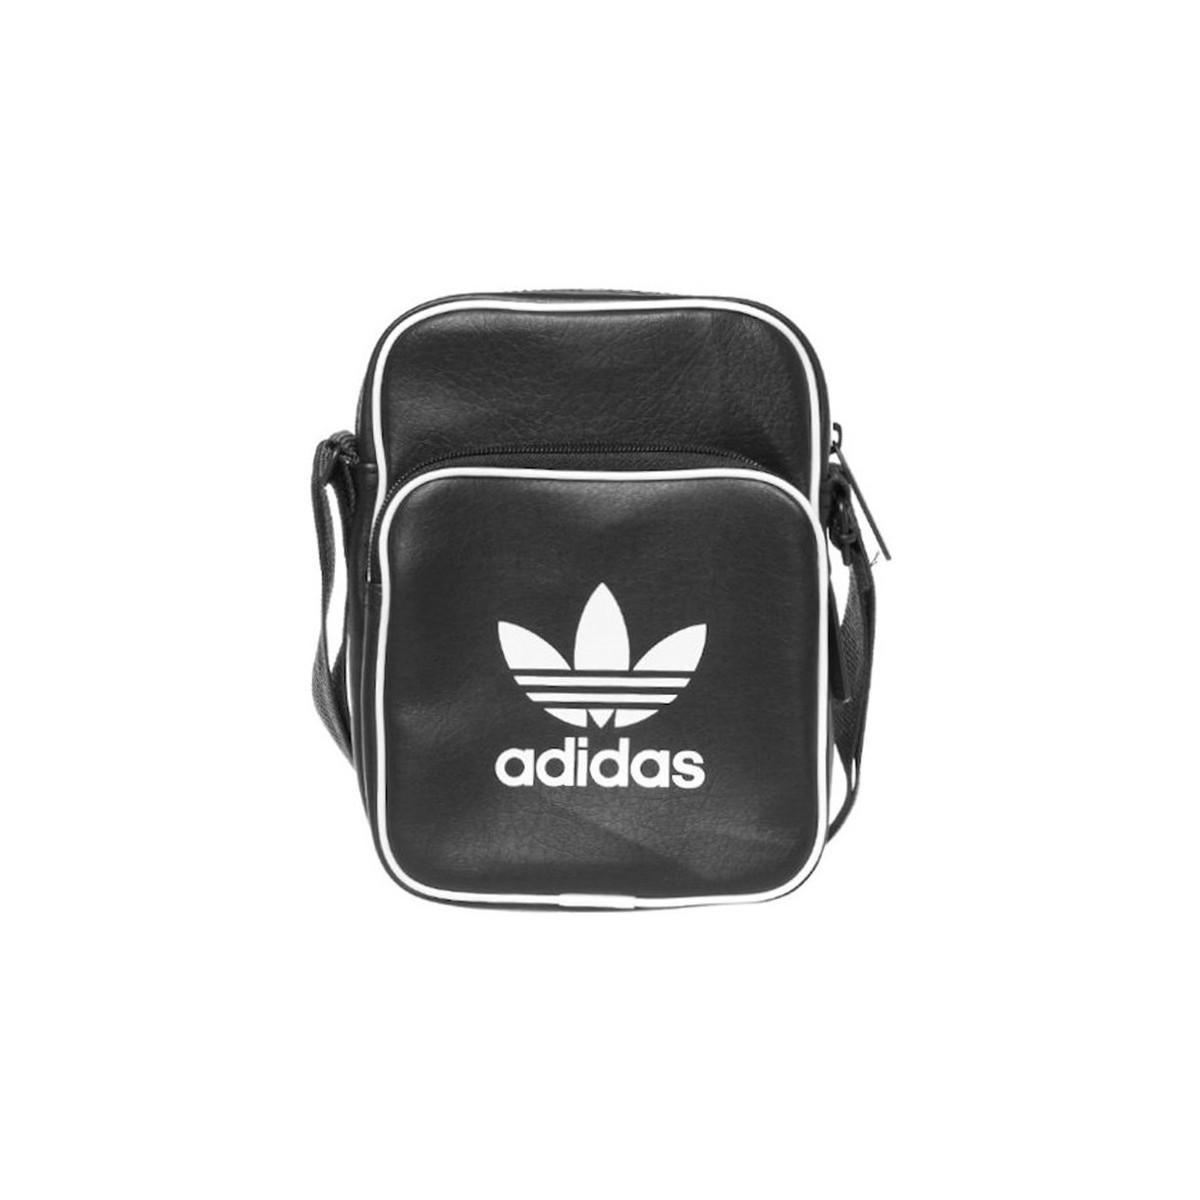 250cd2fef011 adidas Mini Bag Classic Men s Shoulder Bag In Black in Black for Men ...